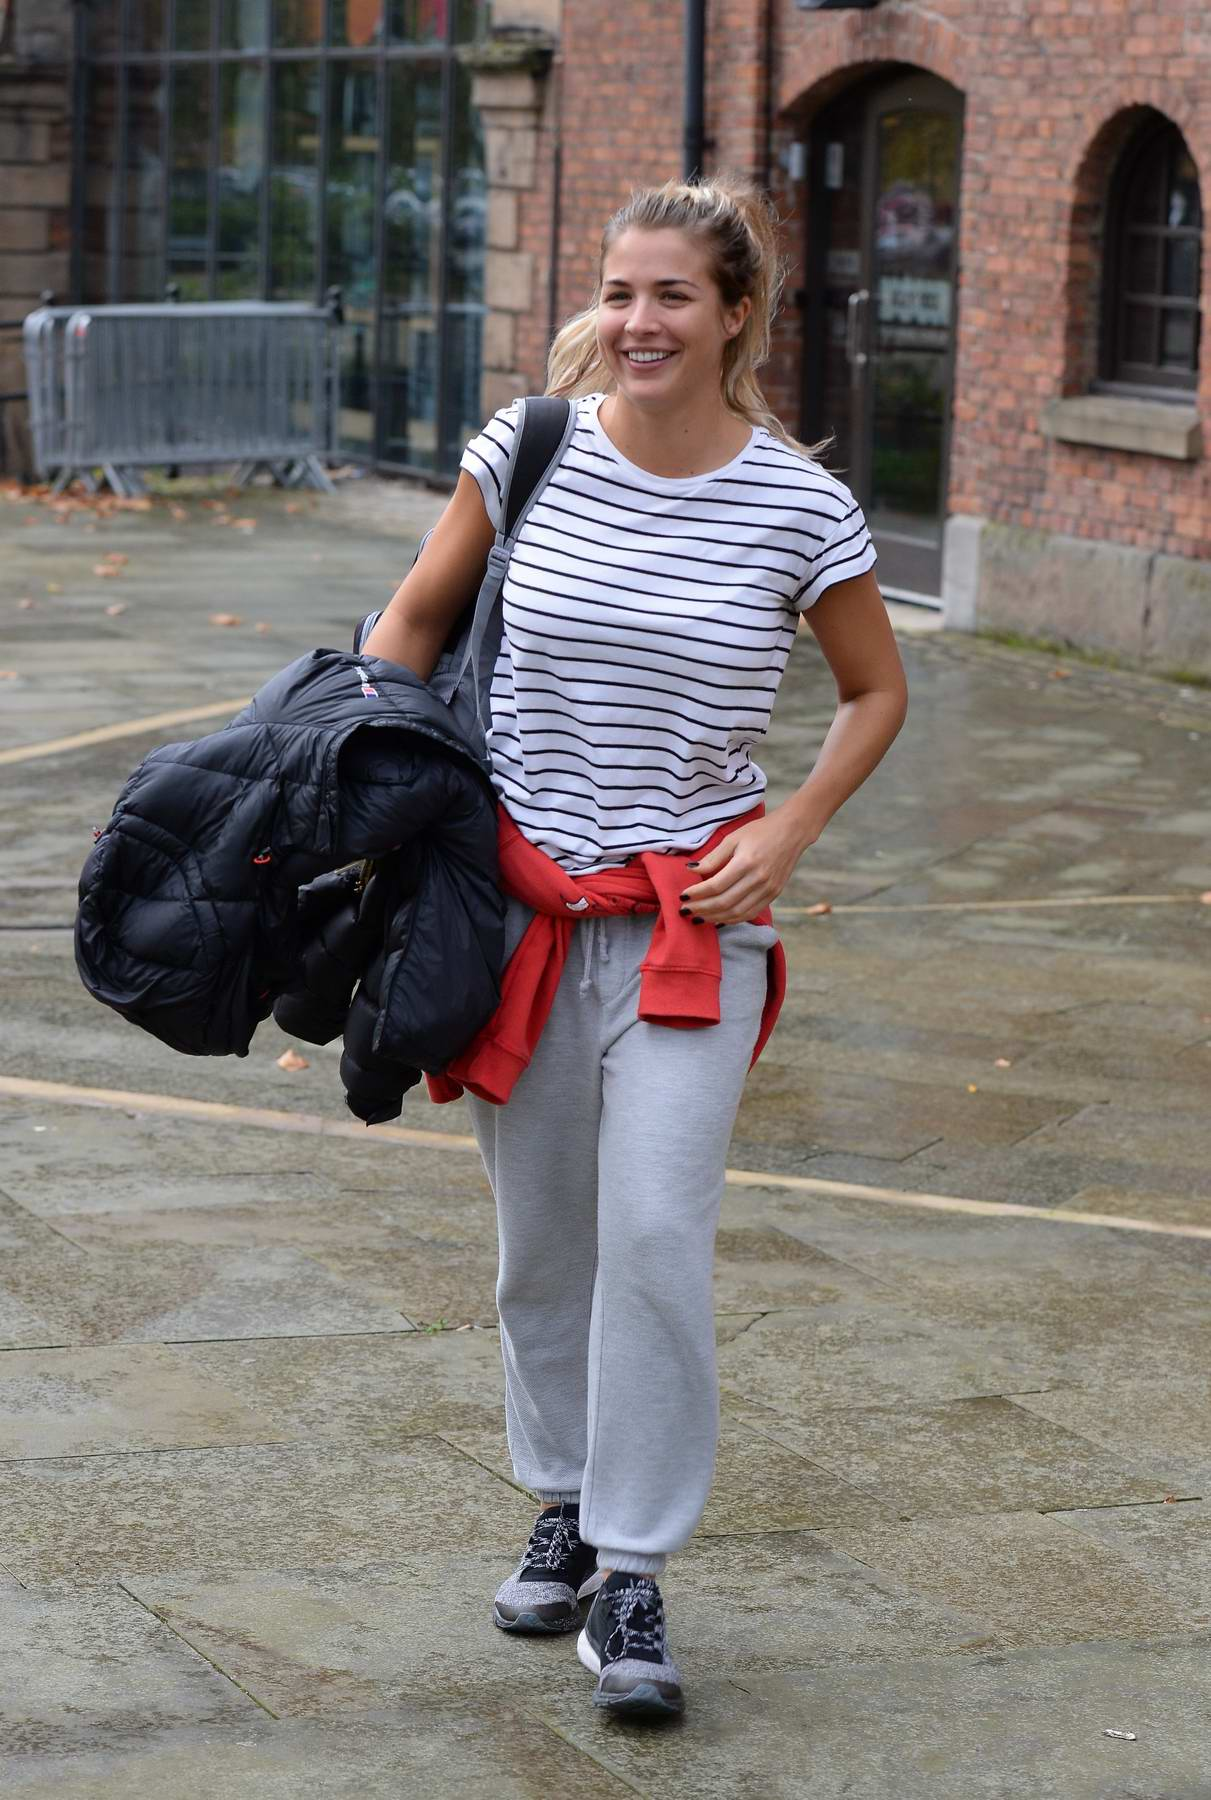 Gemma Atkinson leaves Key 103 radio station in Manchester, UK